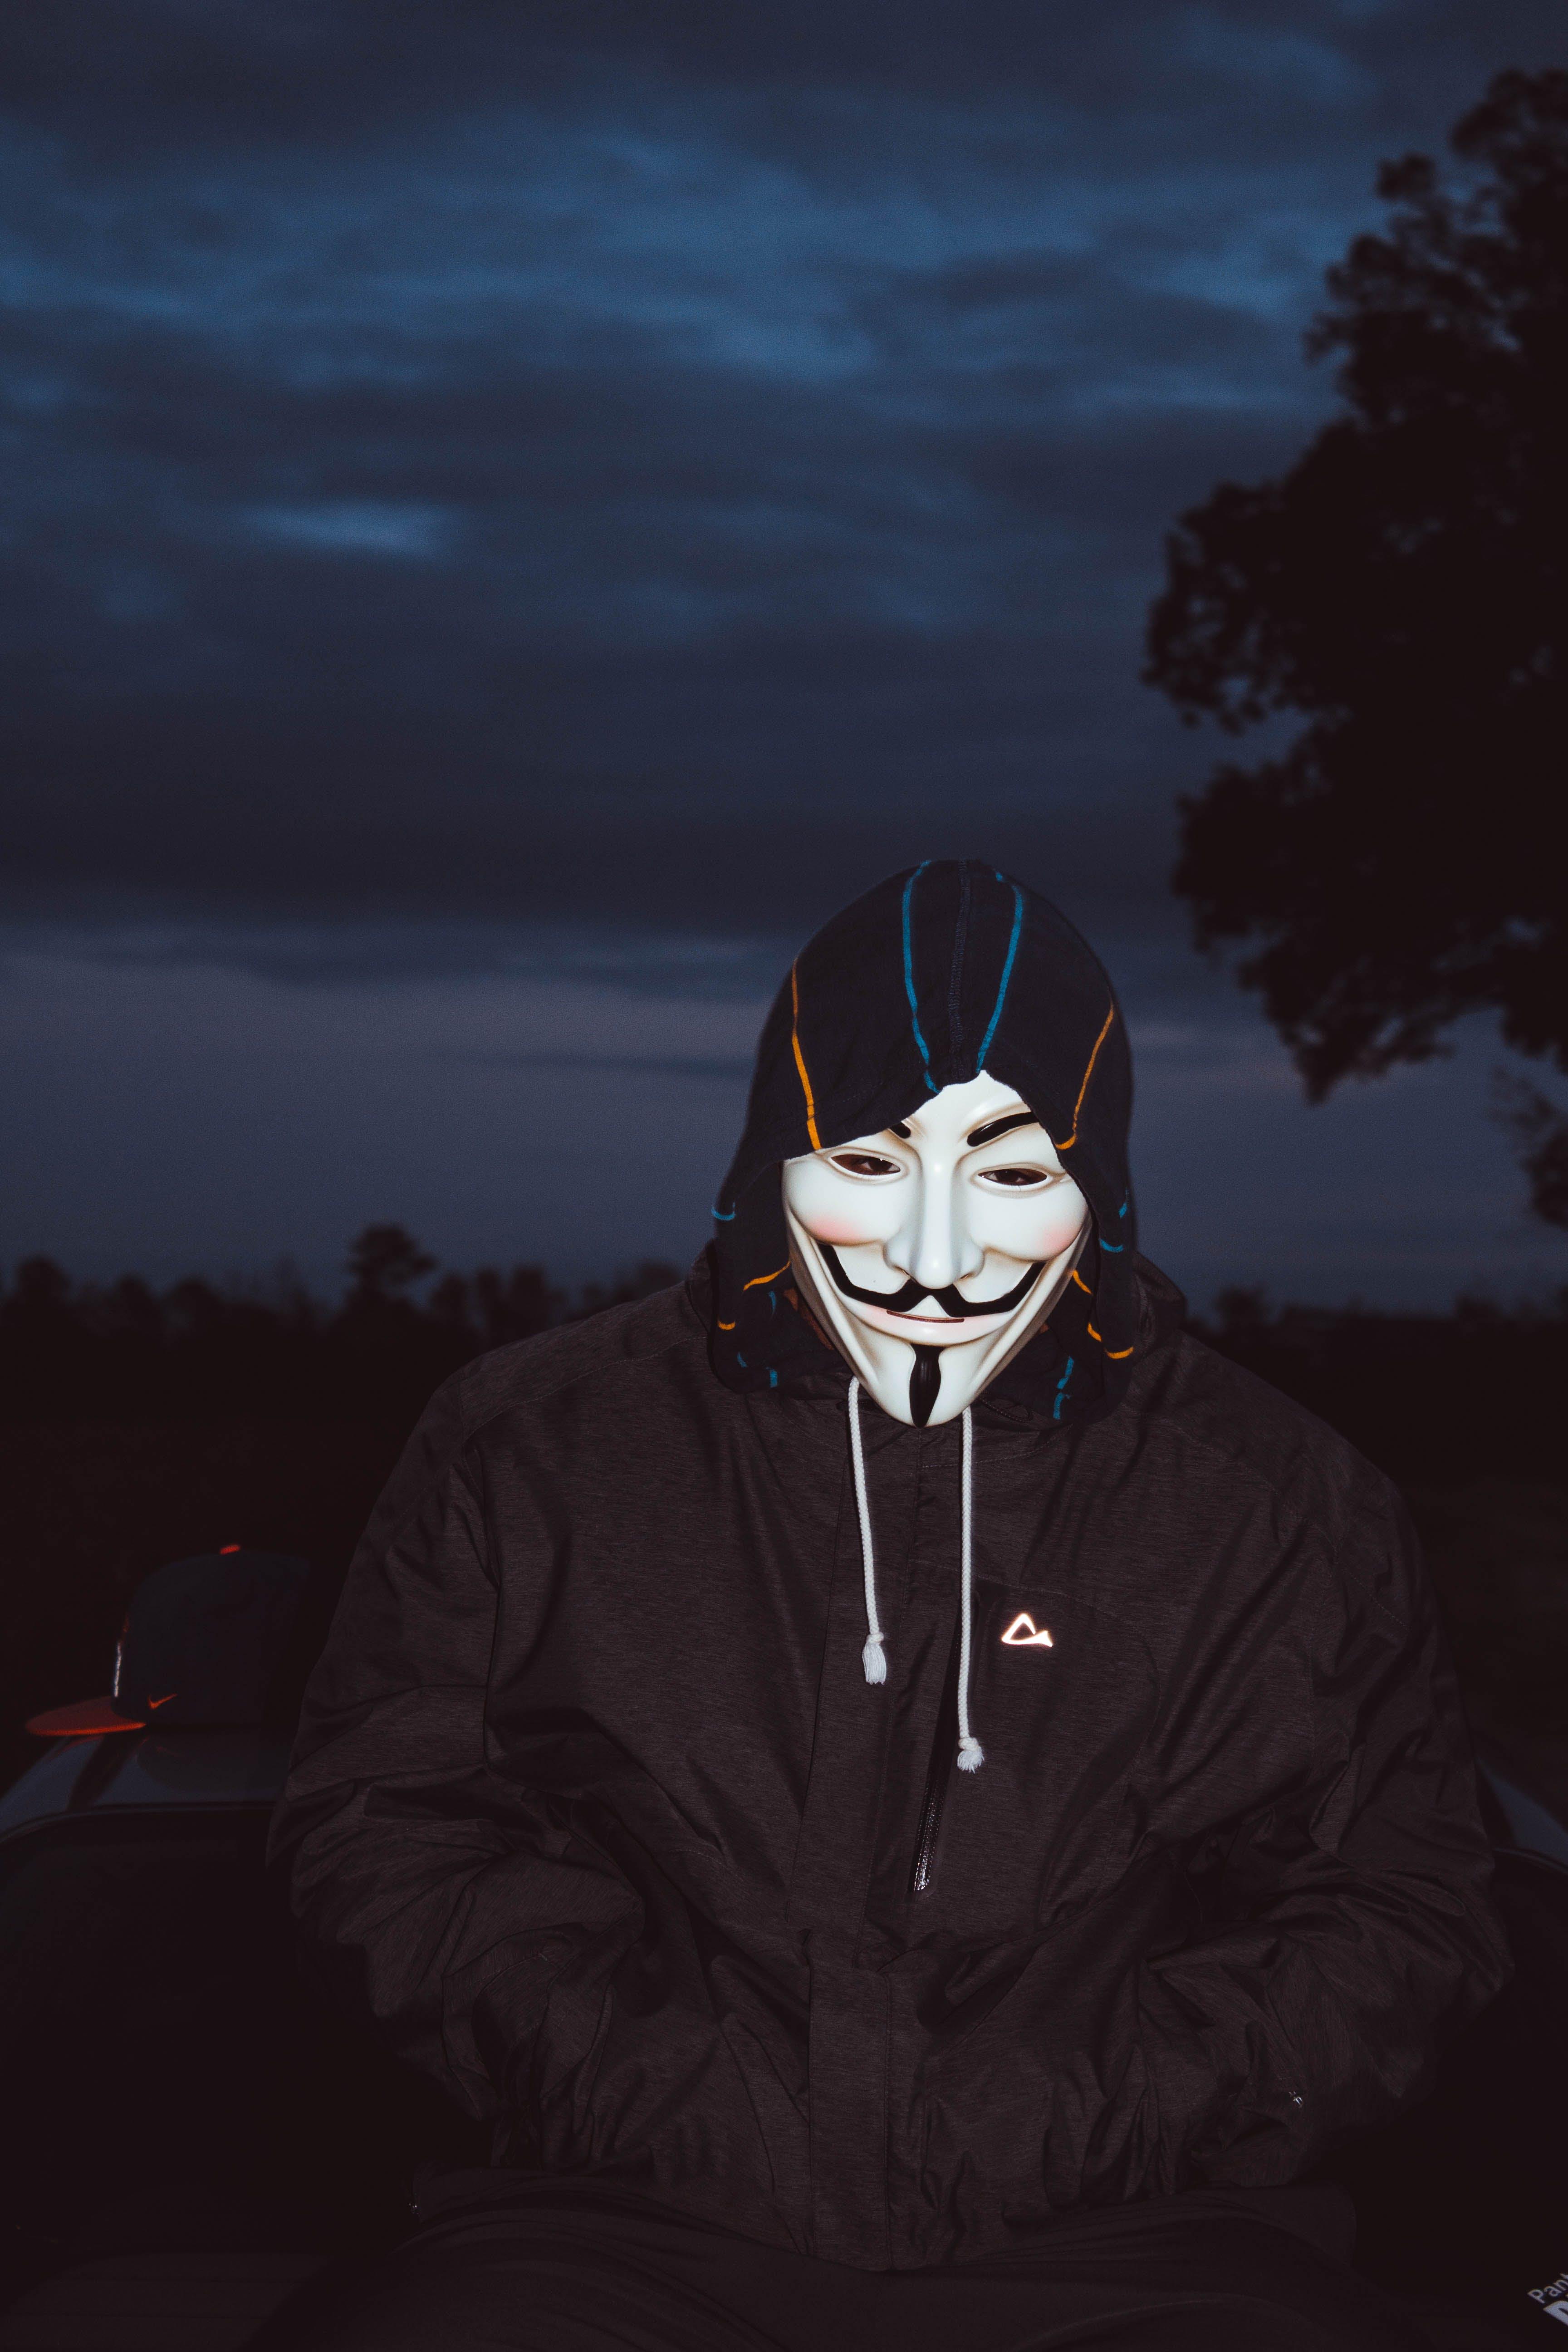 bunda, chlap fawkes maska, děsivý